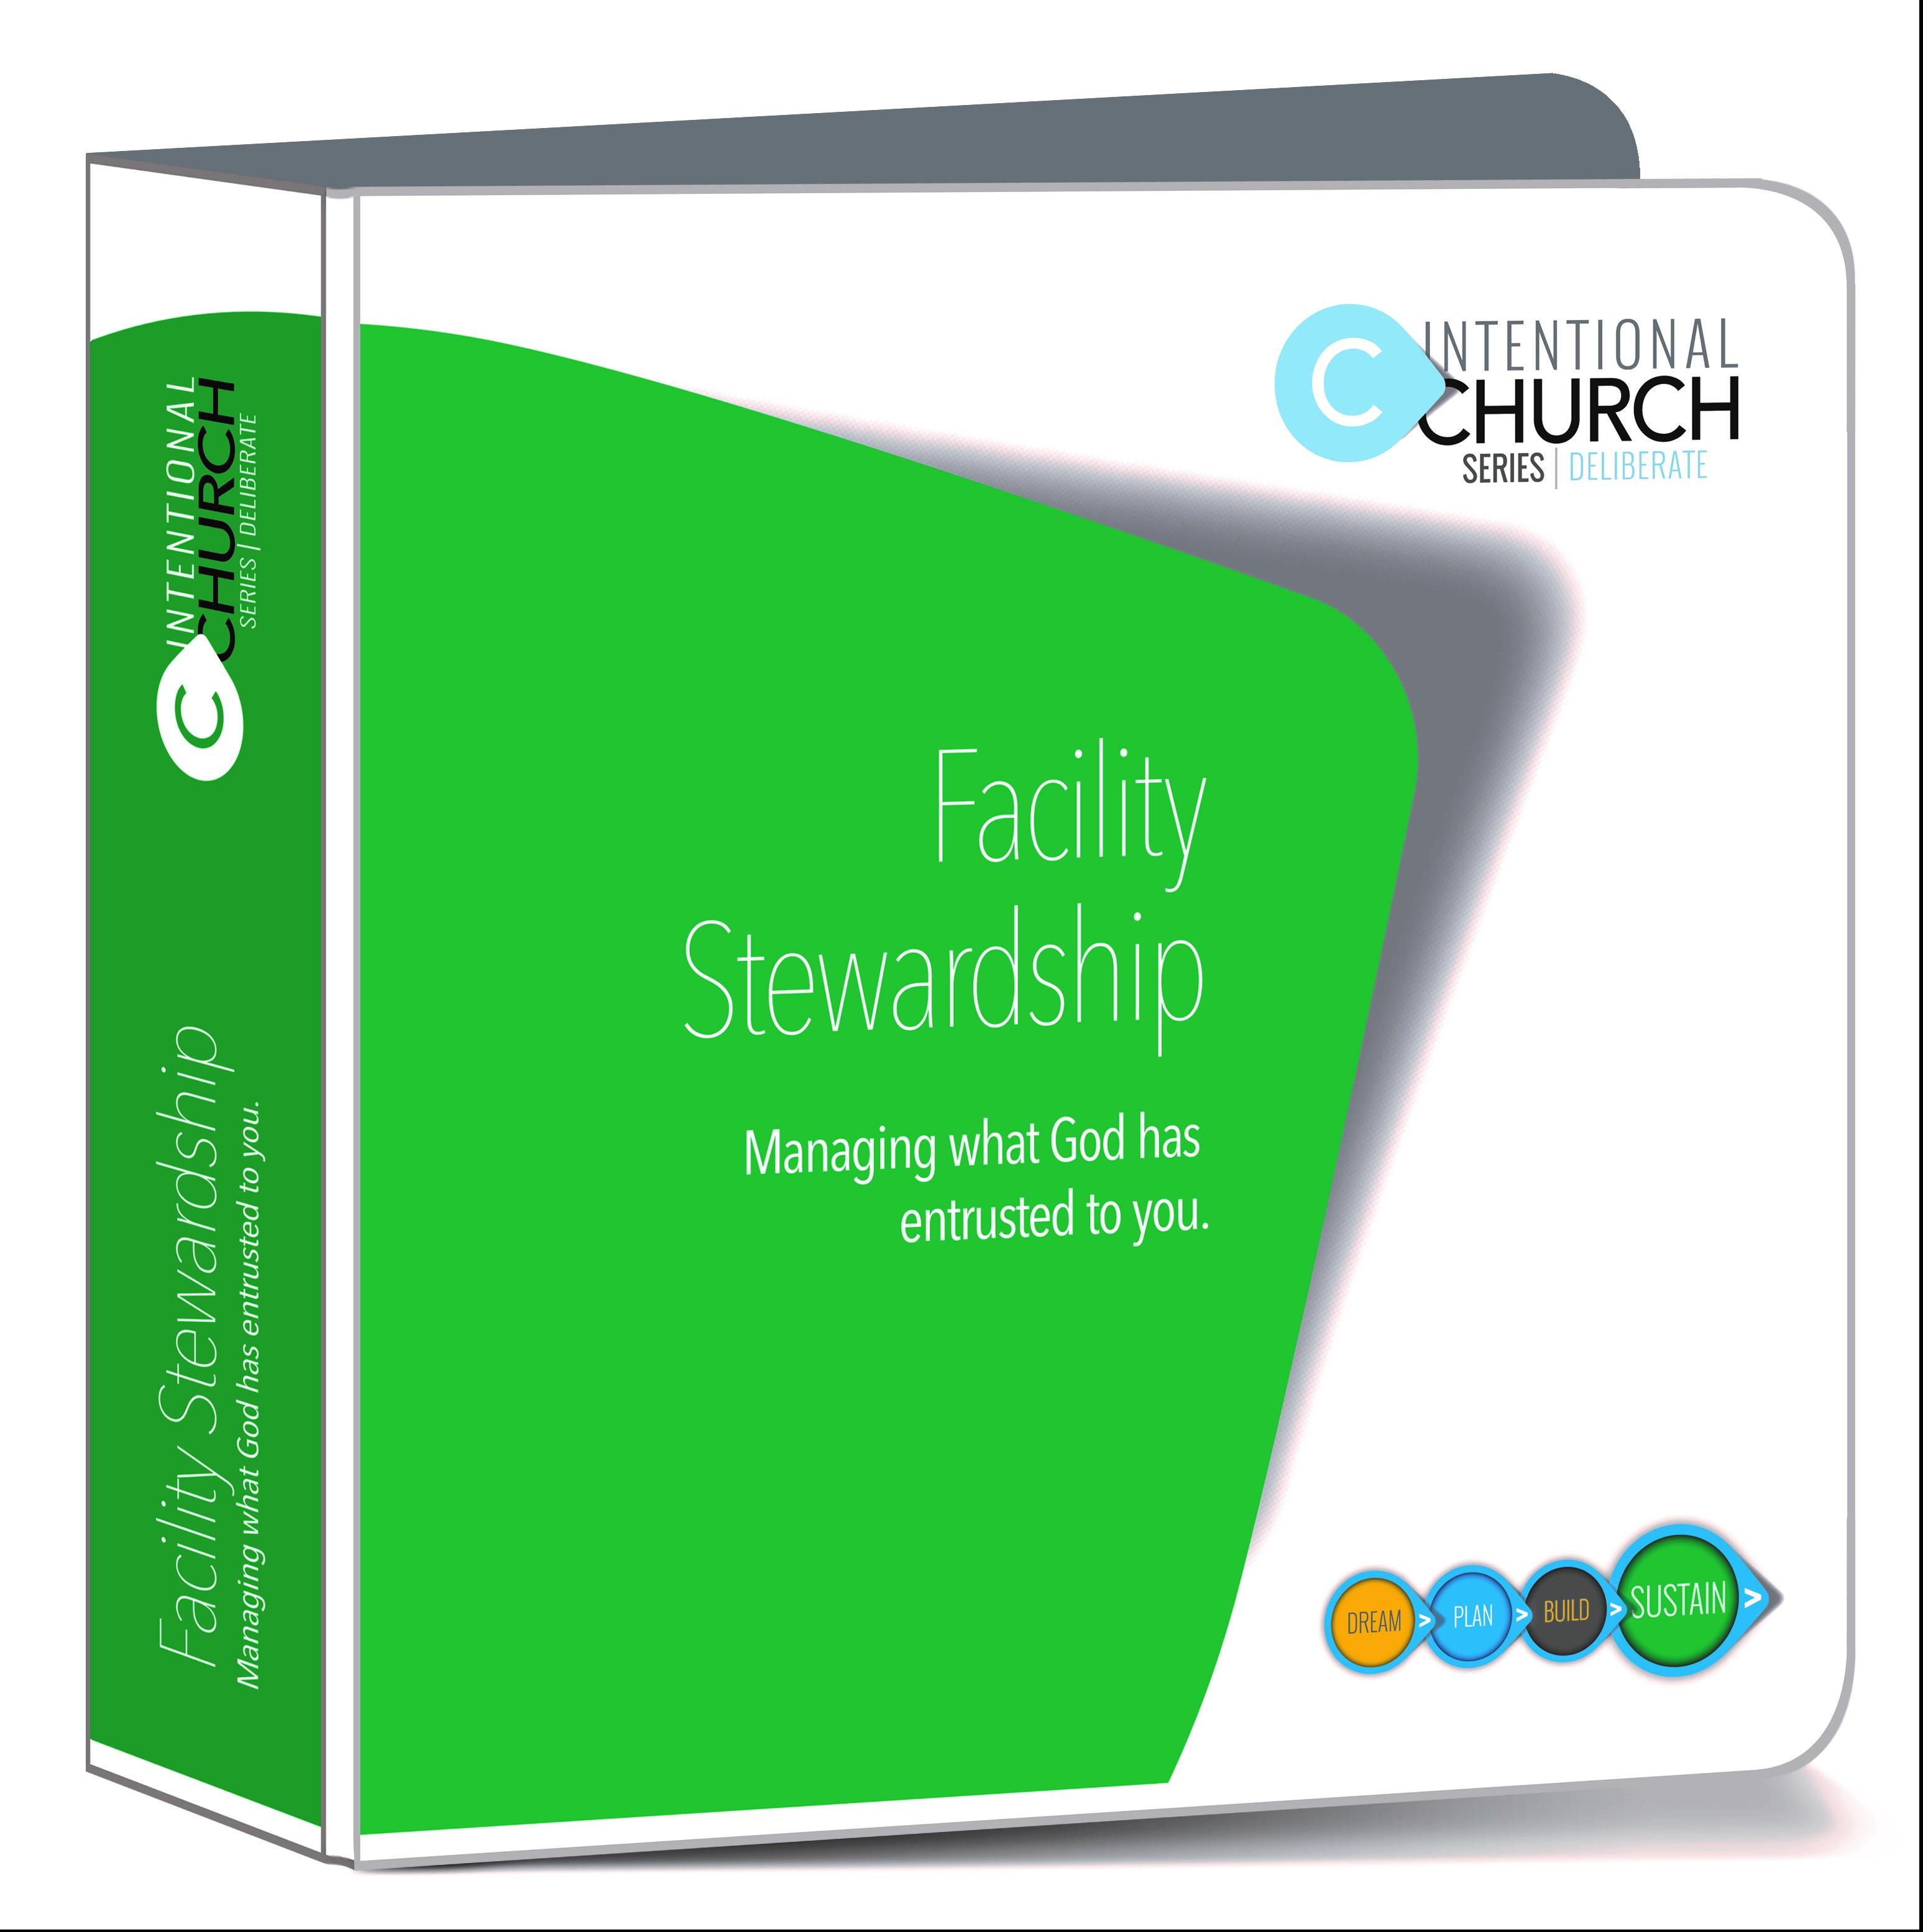 Facility Stewardship - Intentional Church Series Binder